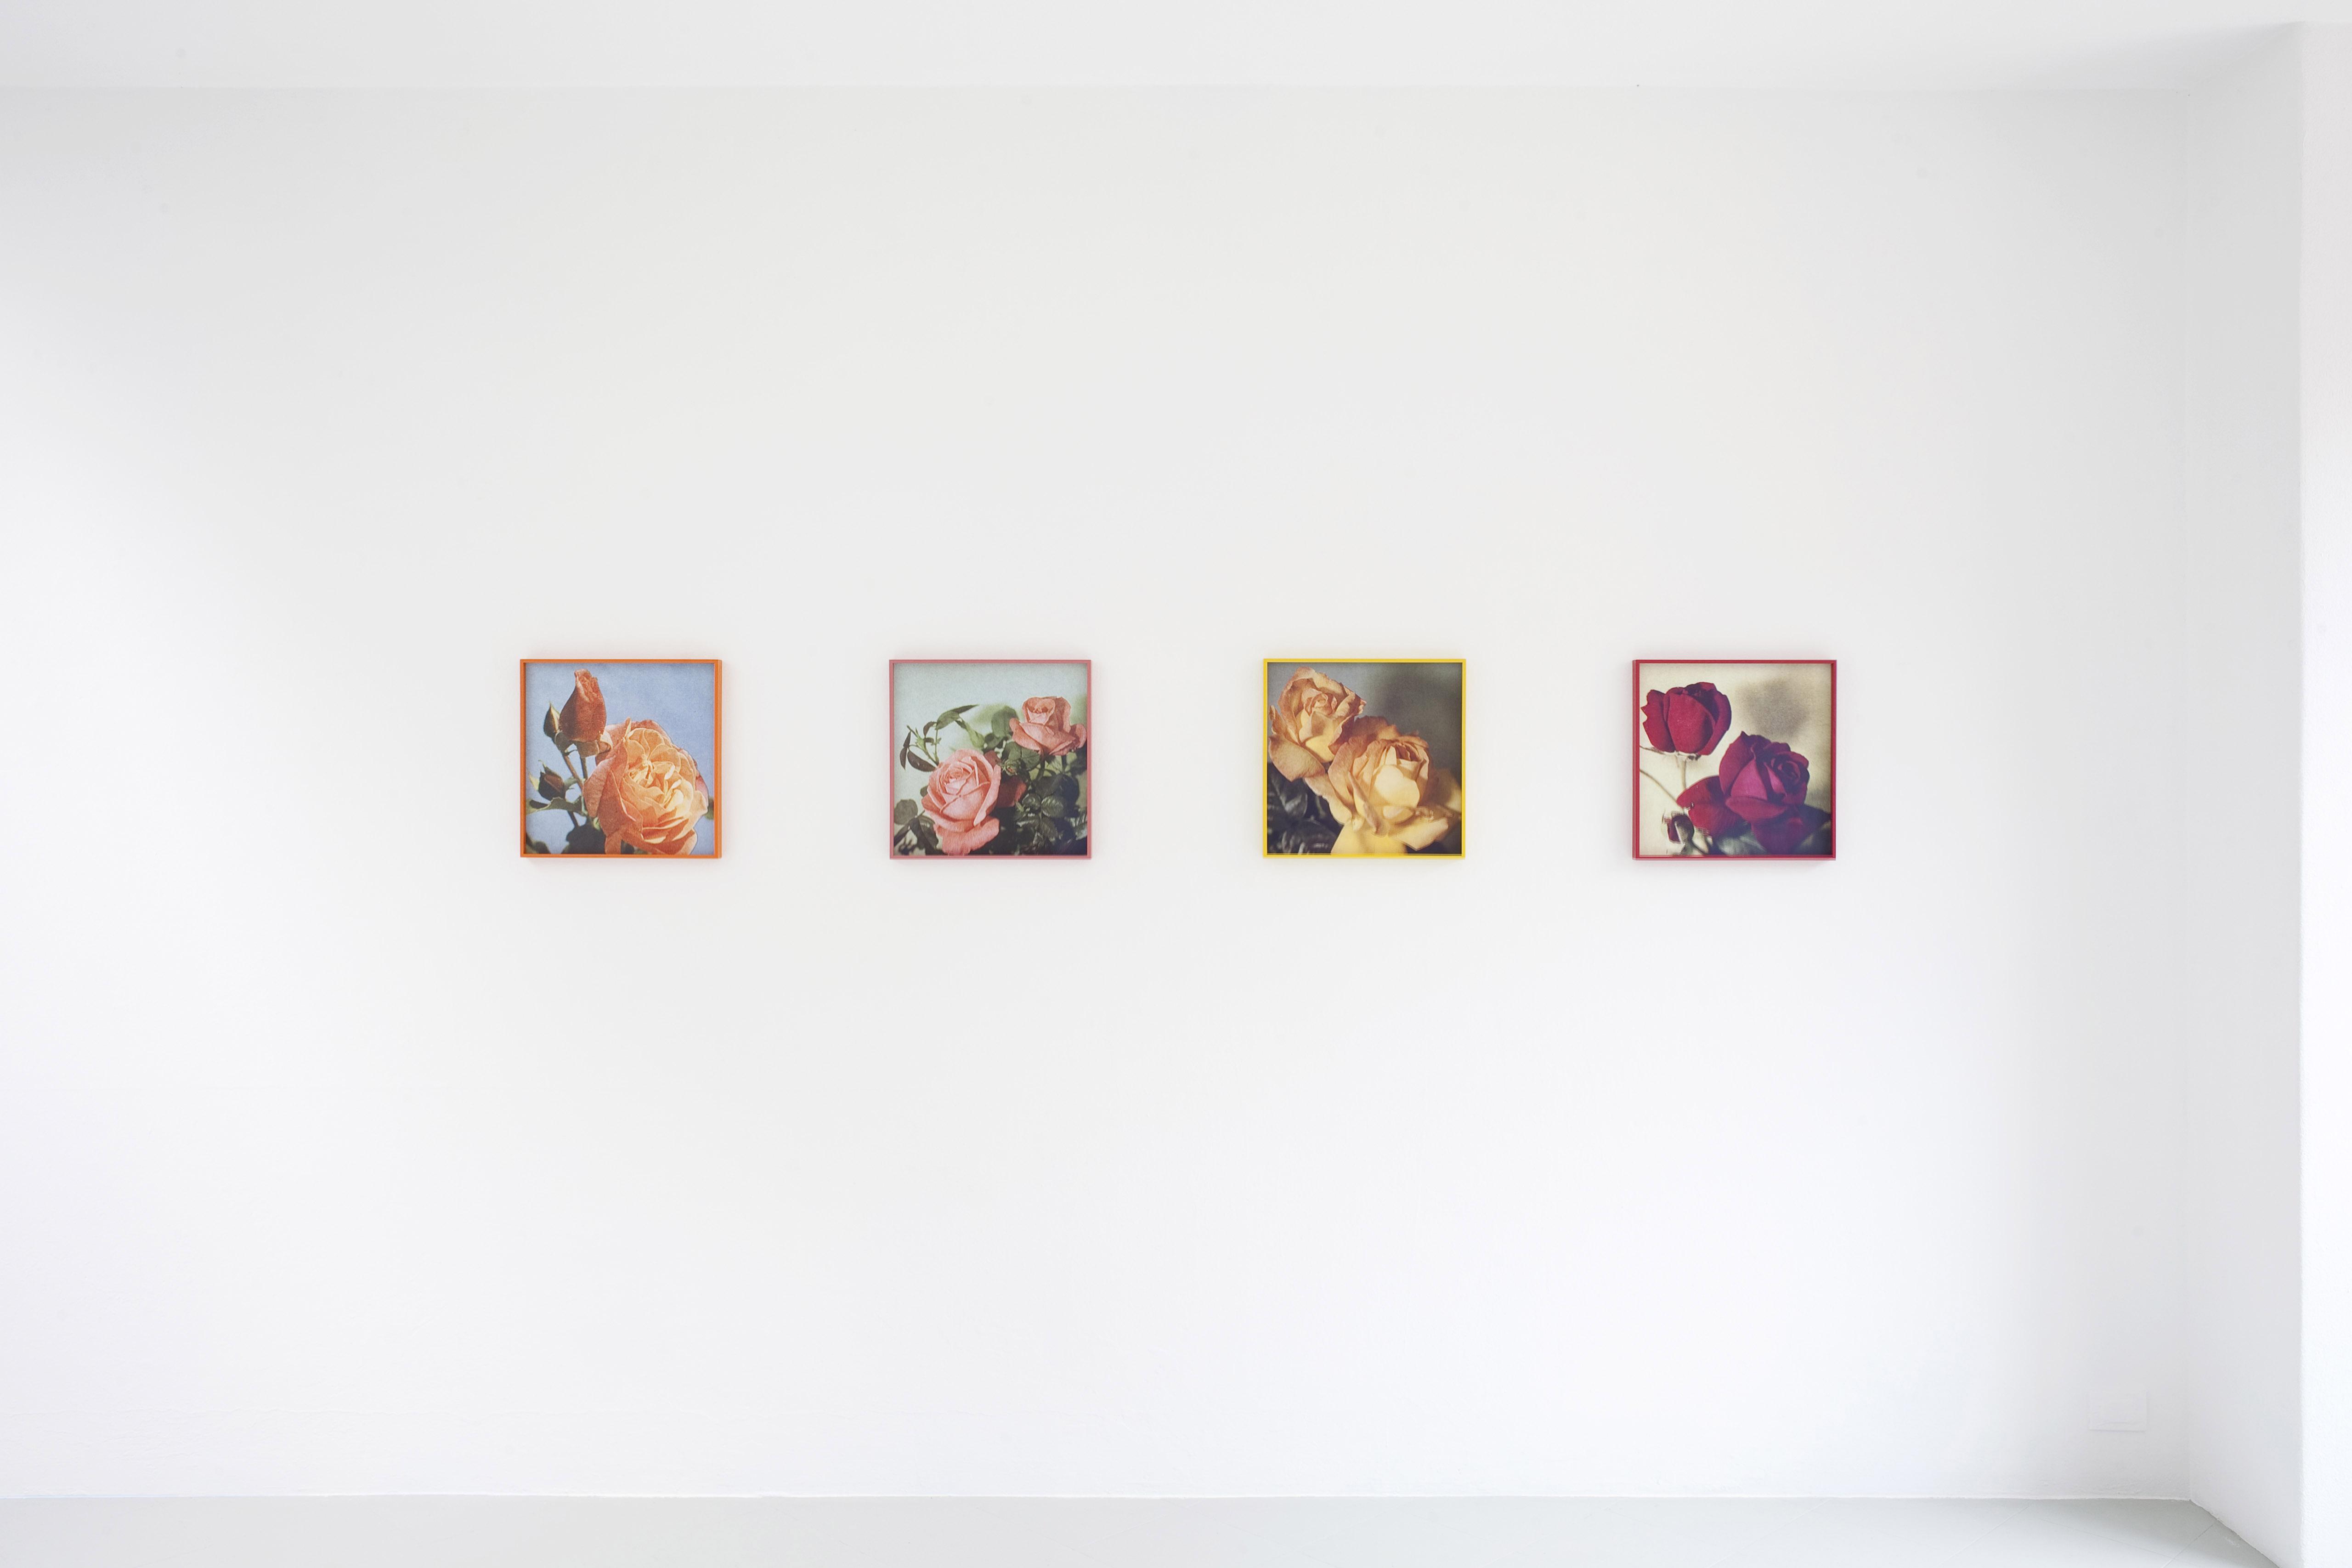 6 - Talisa Lallai Loveliness Extreme2016 Inkjet Print each 41x41 cm - Courtesy Studiolo Milan